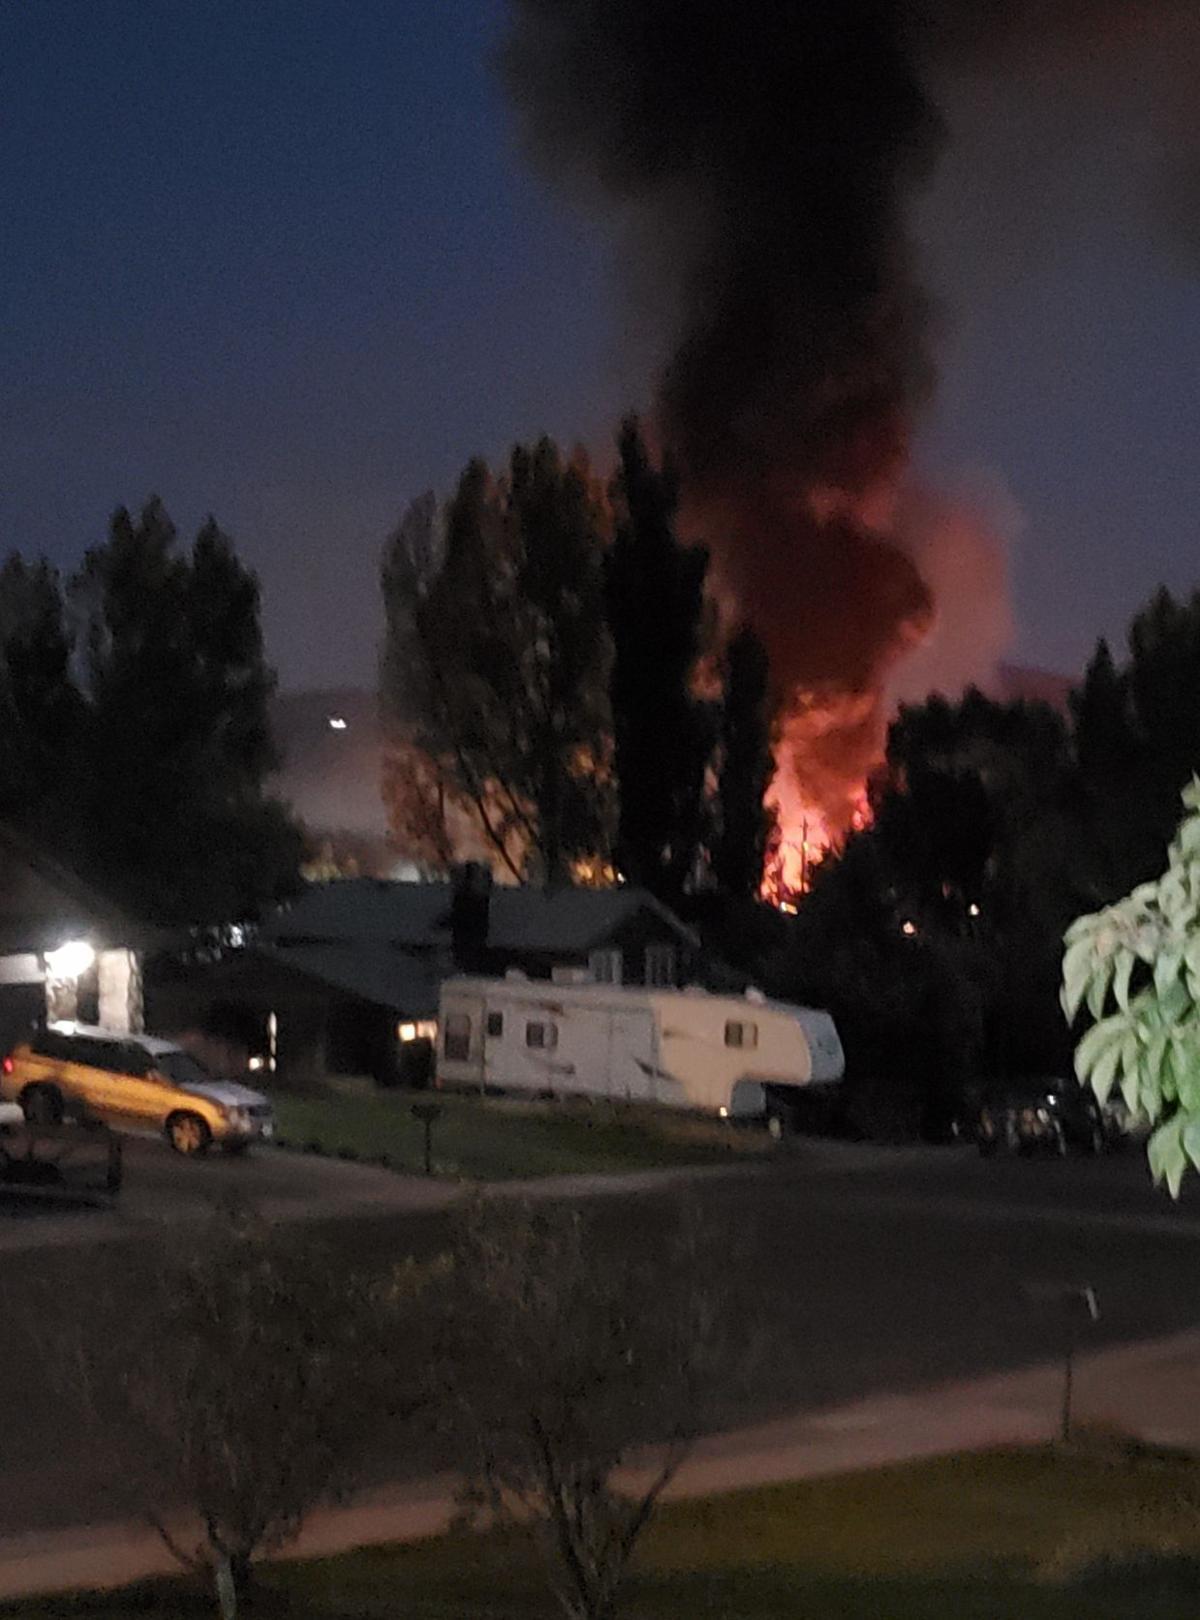 Fiery pileup on Interstate 80